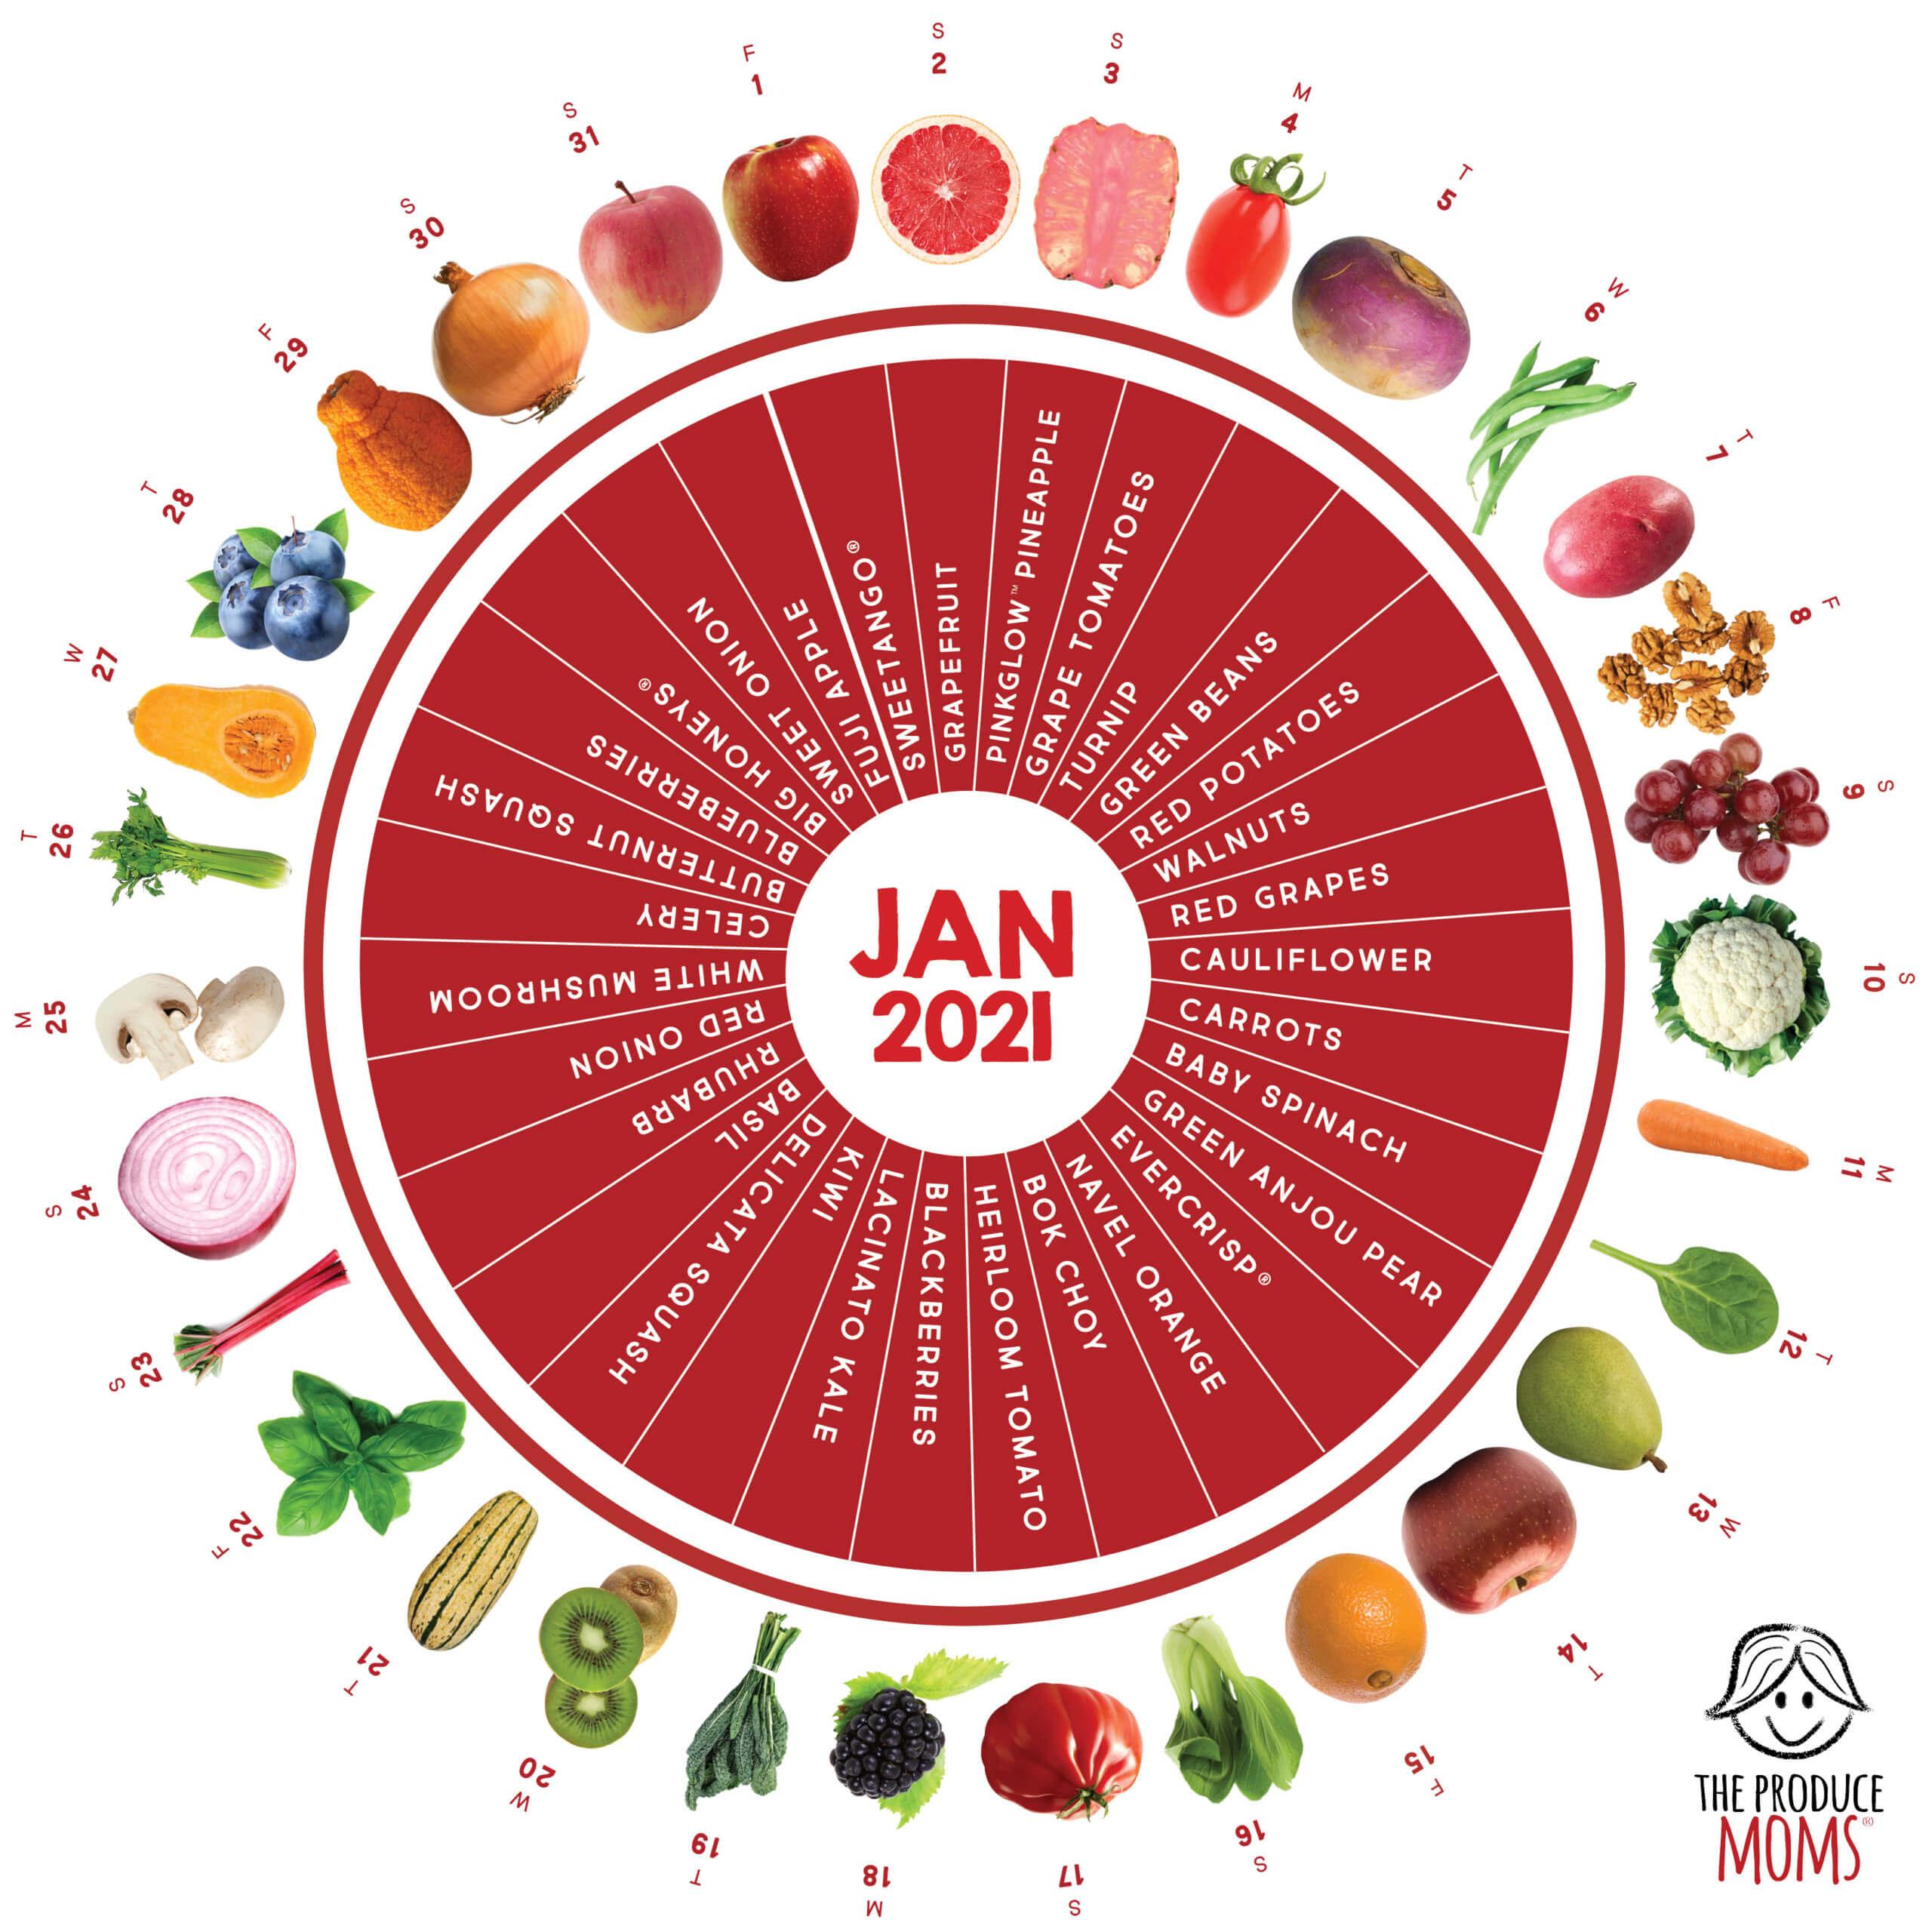 January 2021 Produce Challenge Calendar